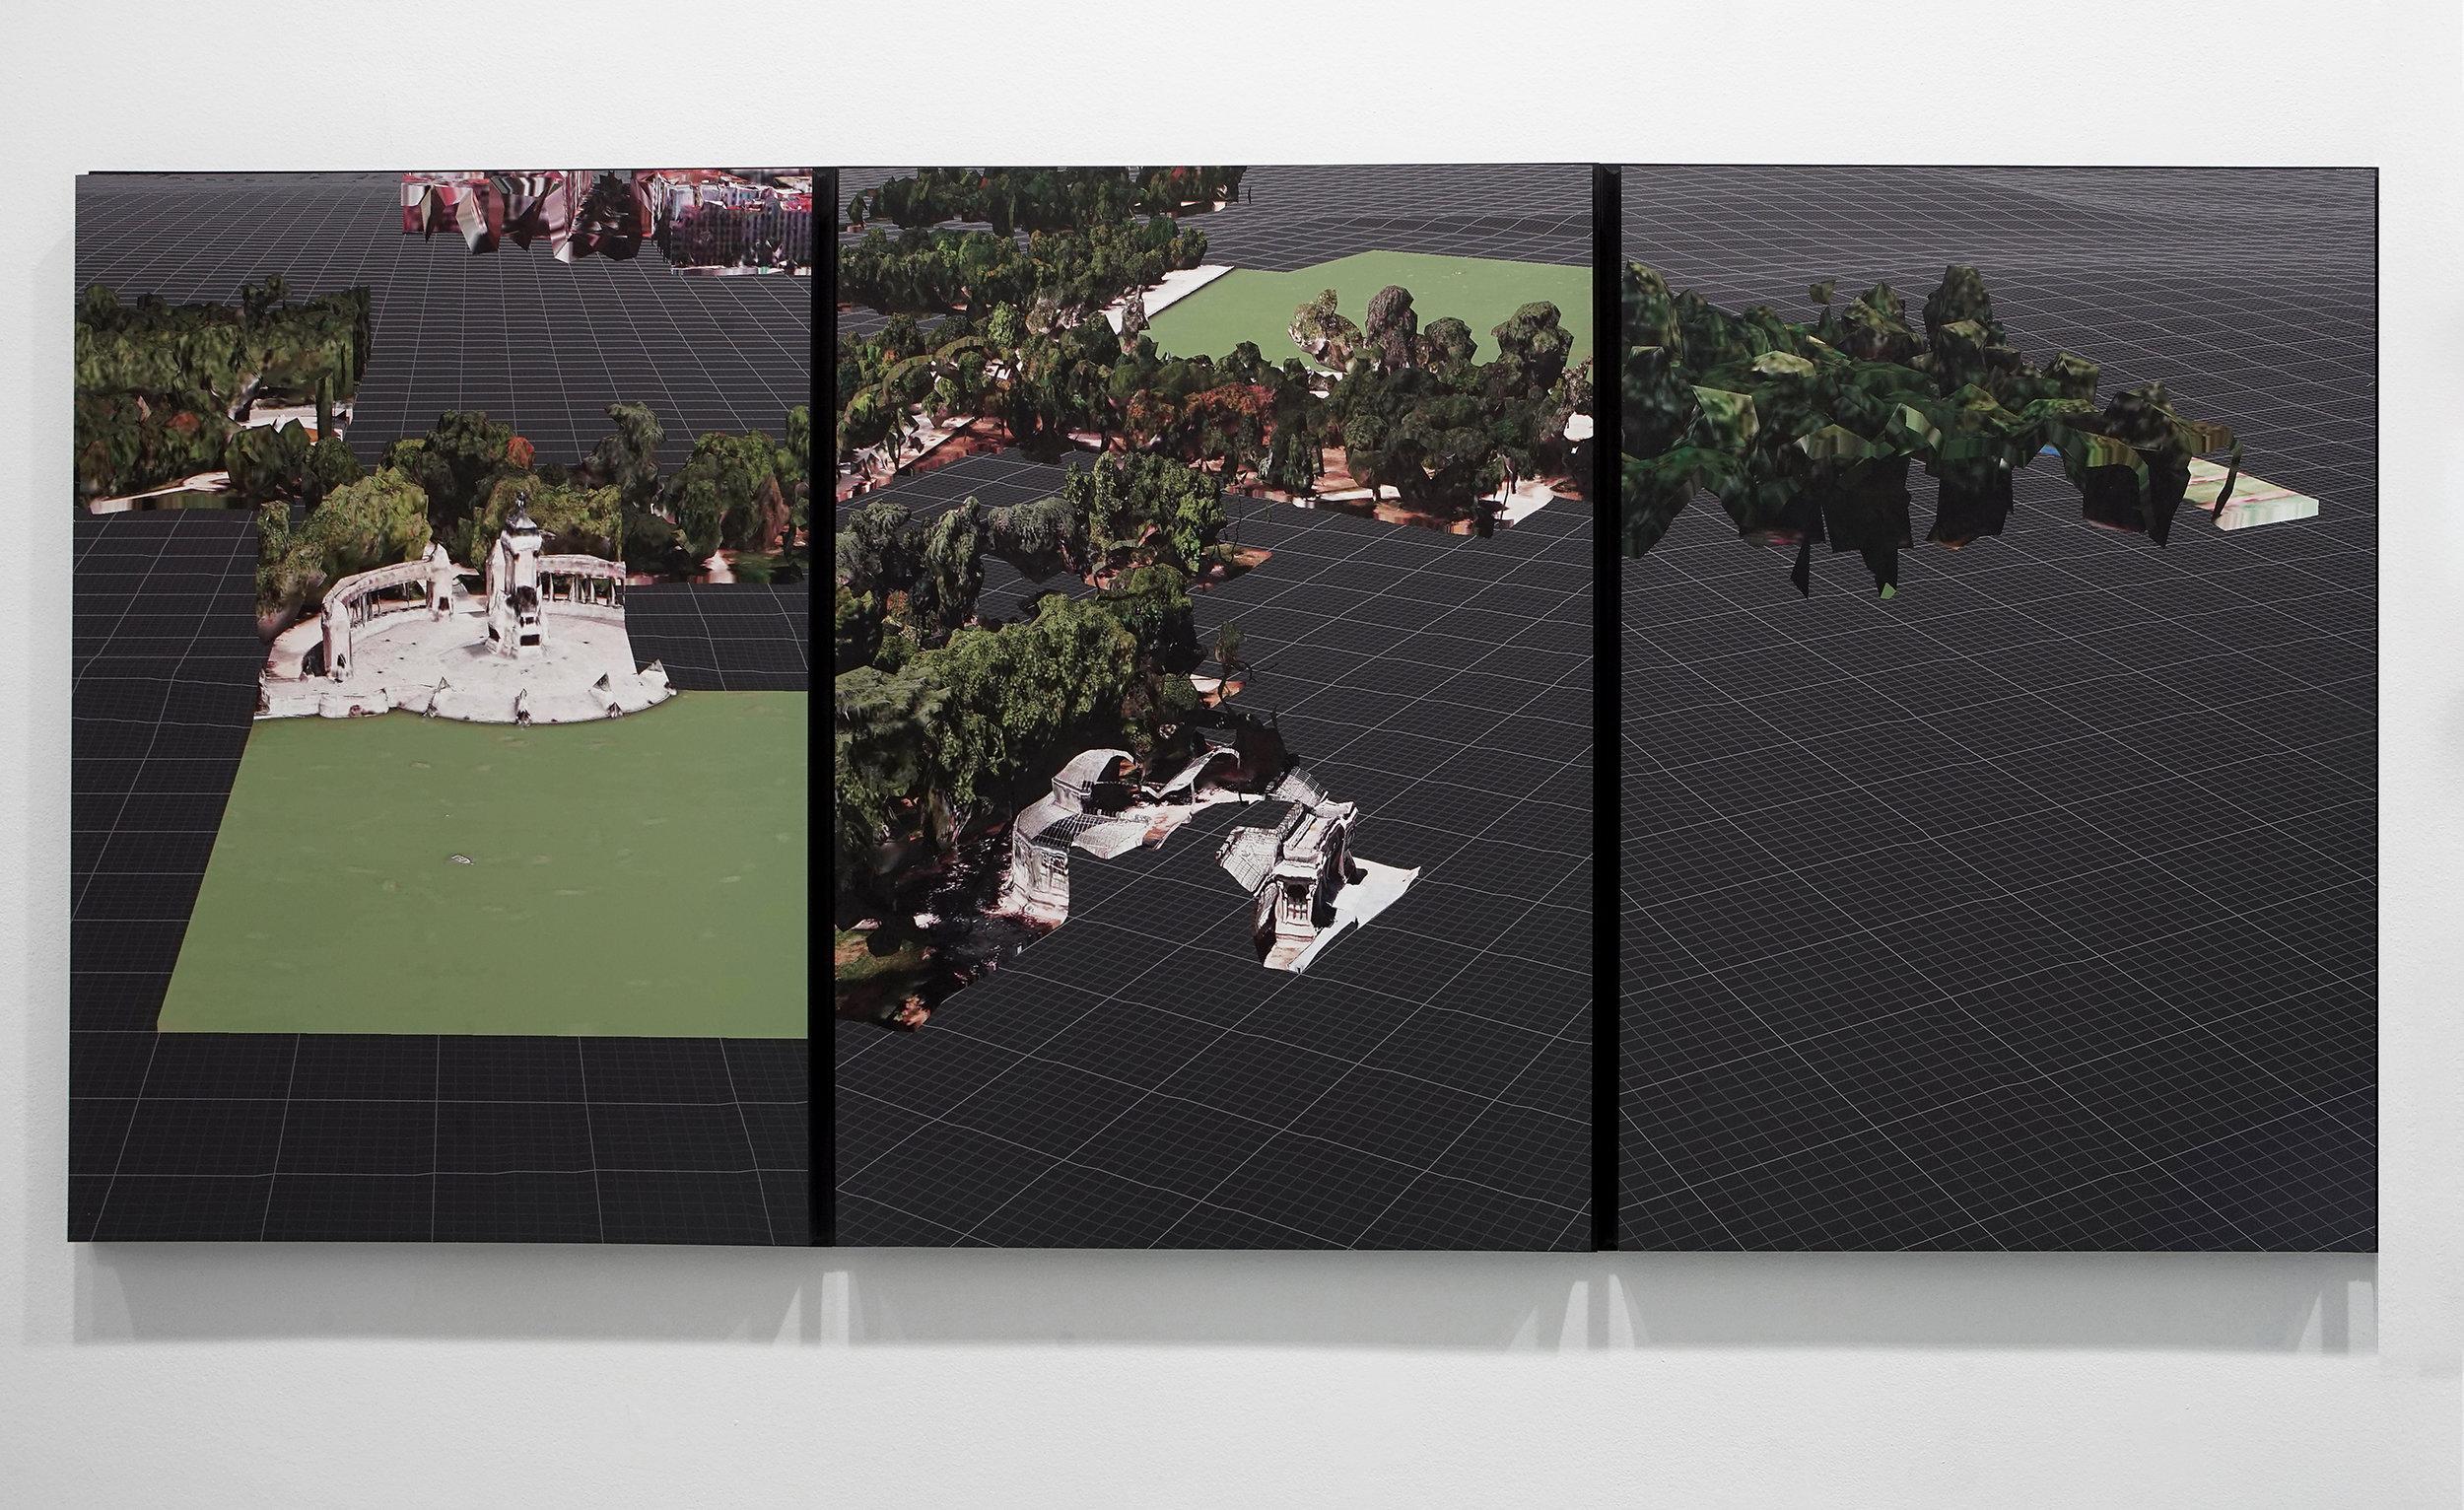 Triggered Glitches_MAD Retiro (triptych), 2017  1800 X 840mm _ Digital image printed on Dibond